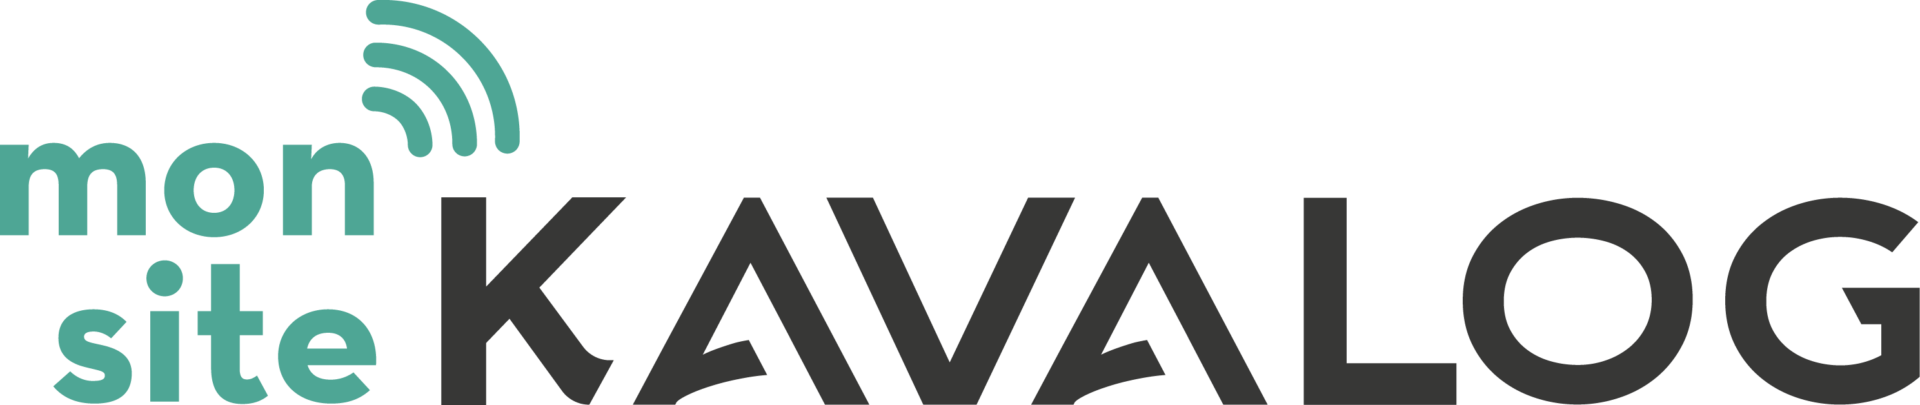 Mon site Kavalog